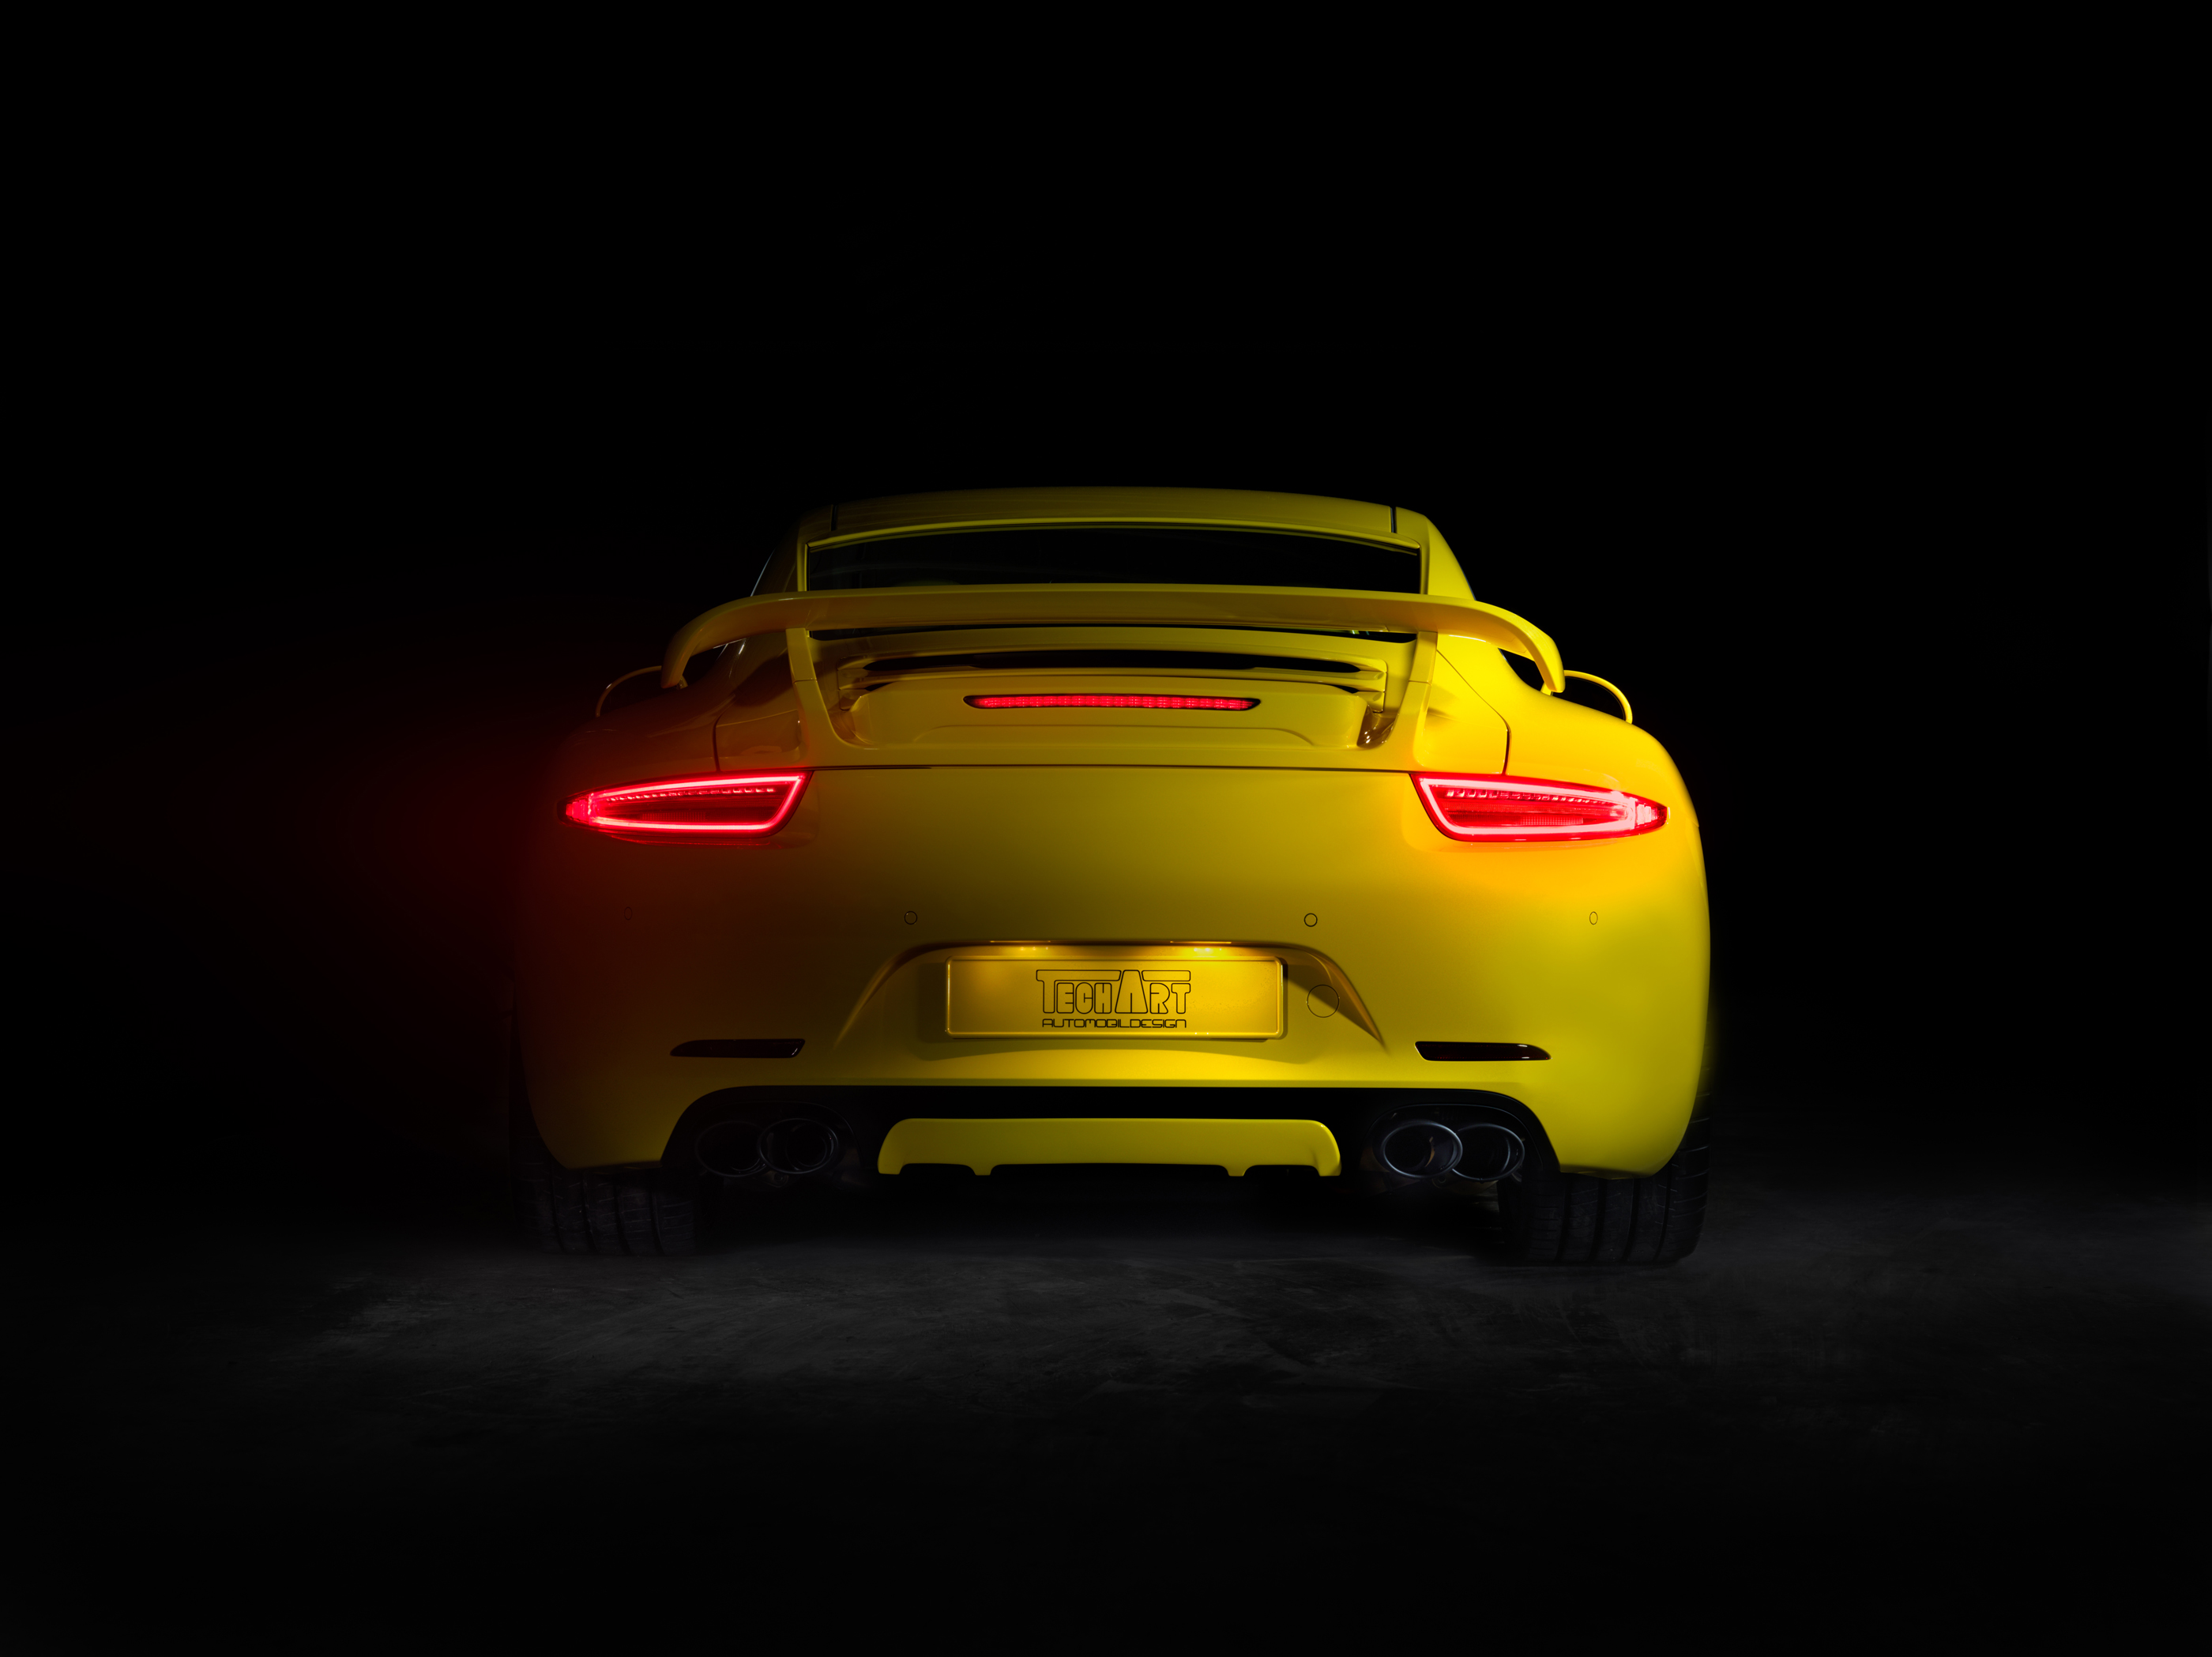 New Porsche 911 Tuning Program By Techart